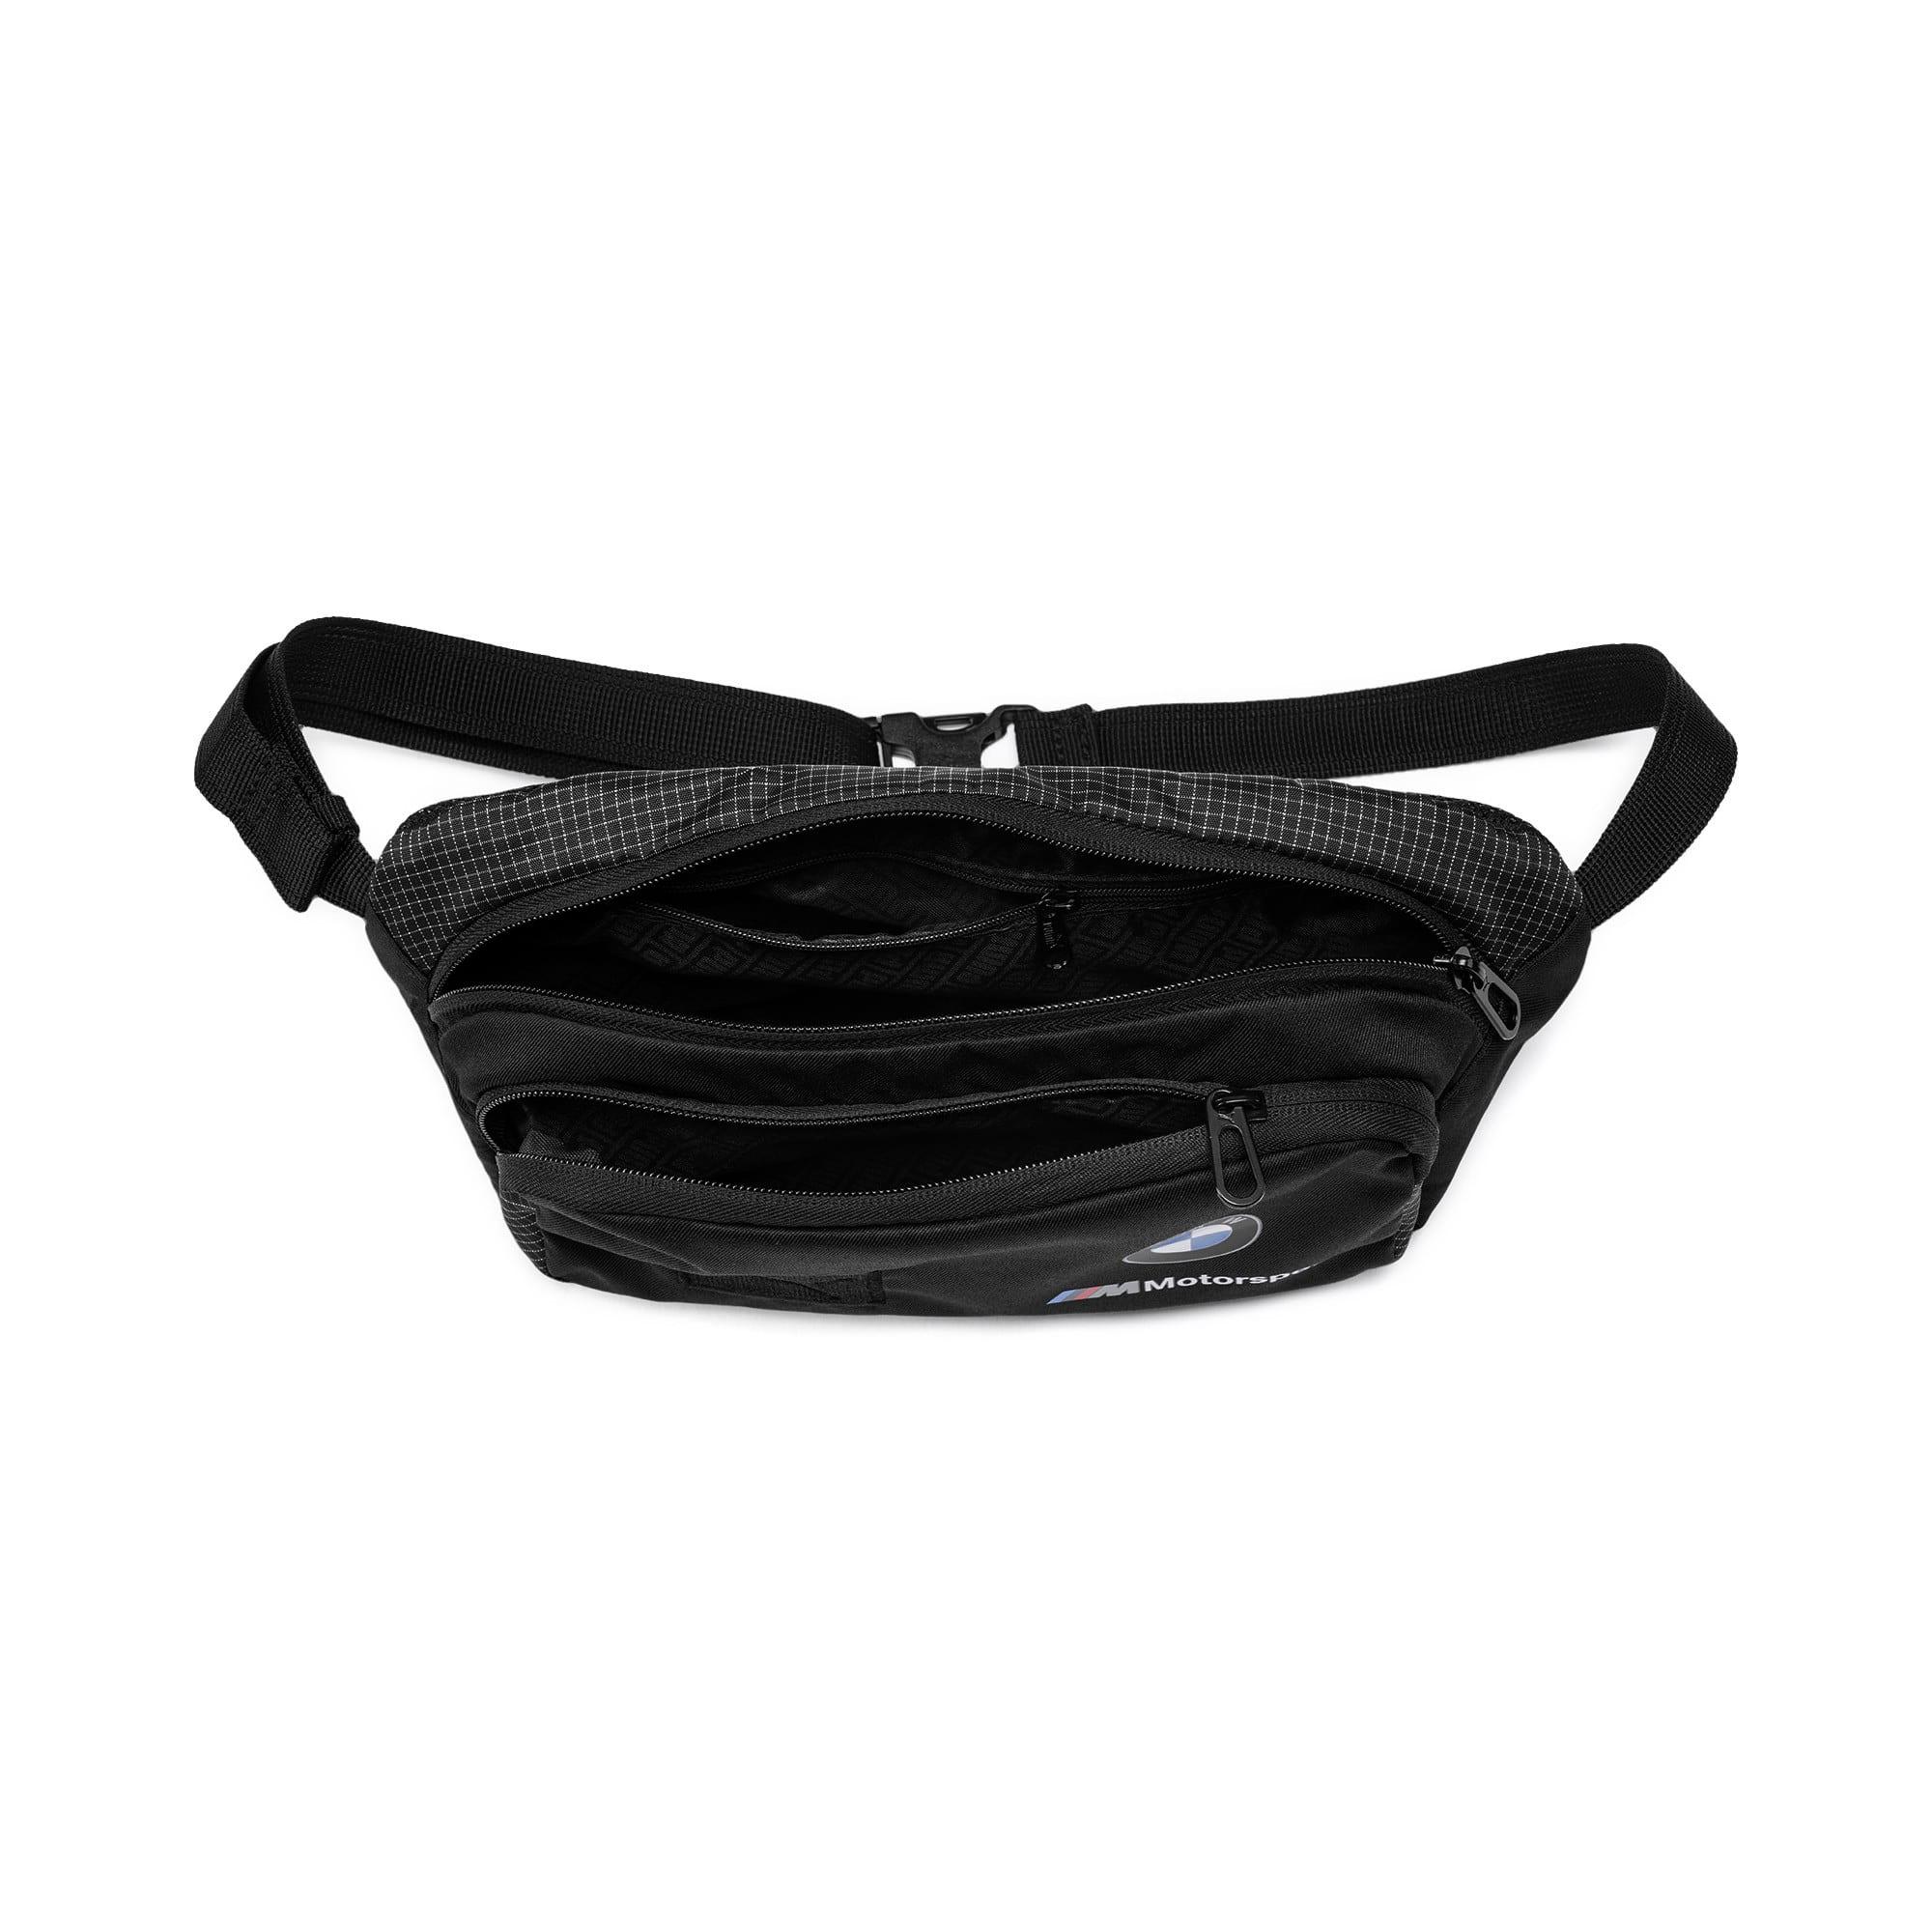 Thumbnail 4 of BMW M Motorsport Waist Bag, Puma Black, medium